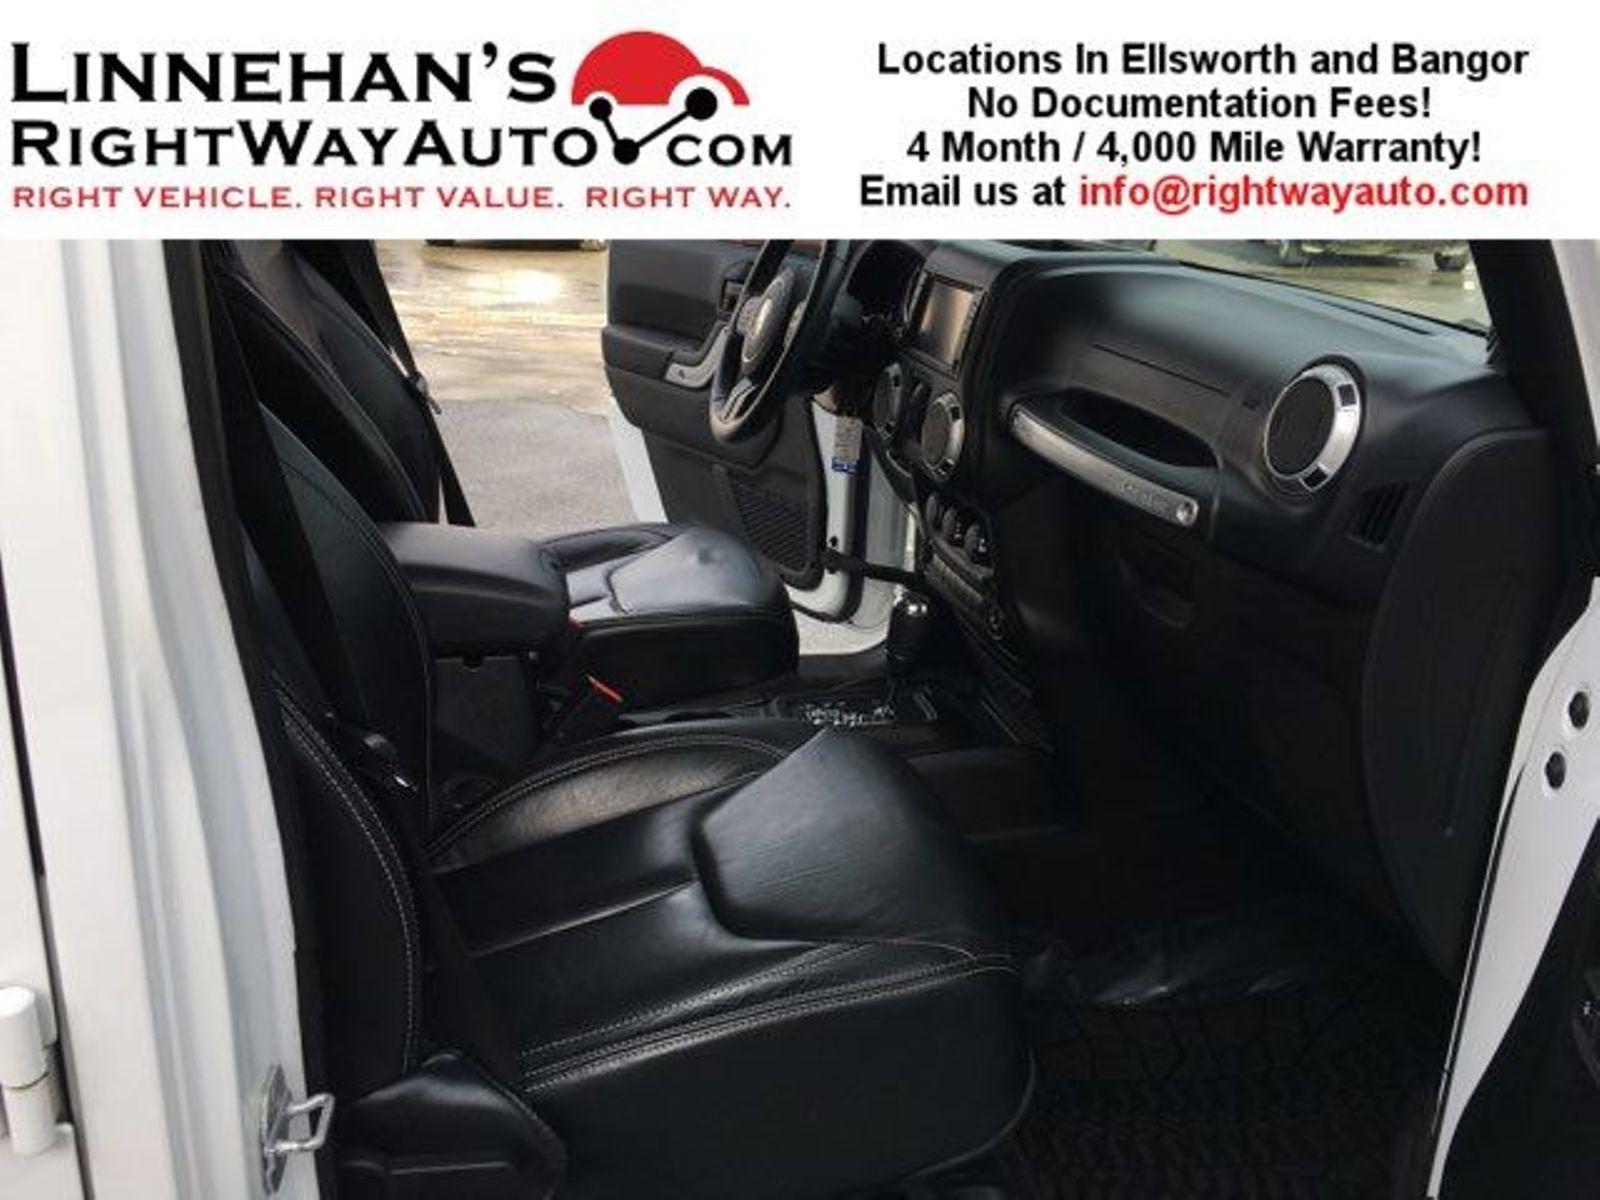 2013 Jeep Wrangler Unlimited Sahara Jk Leather Seats In Bangor Me